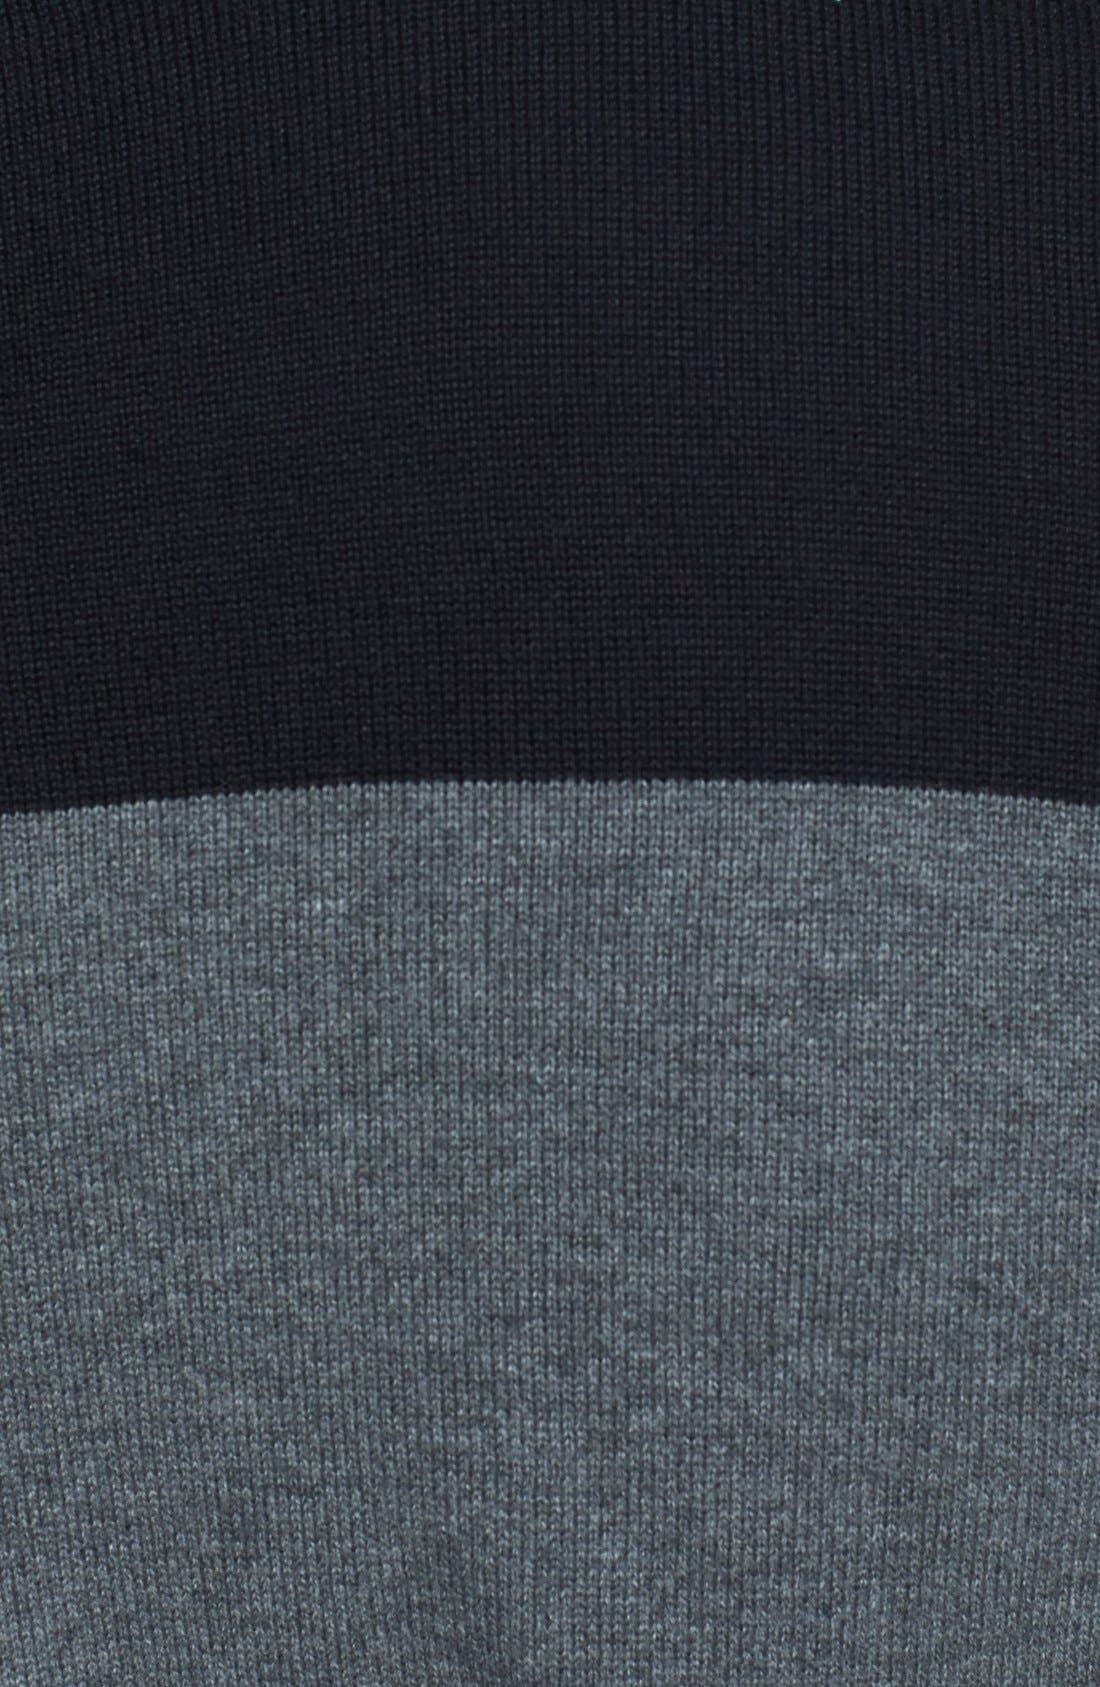 Alternate Image 3  - Topman Two-Tone Panel Crewneck Sweater